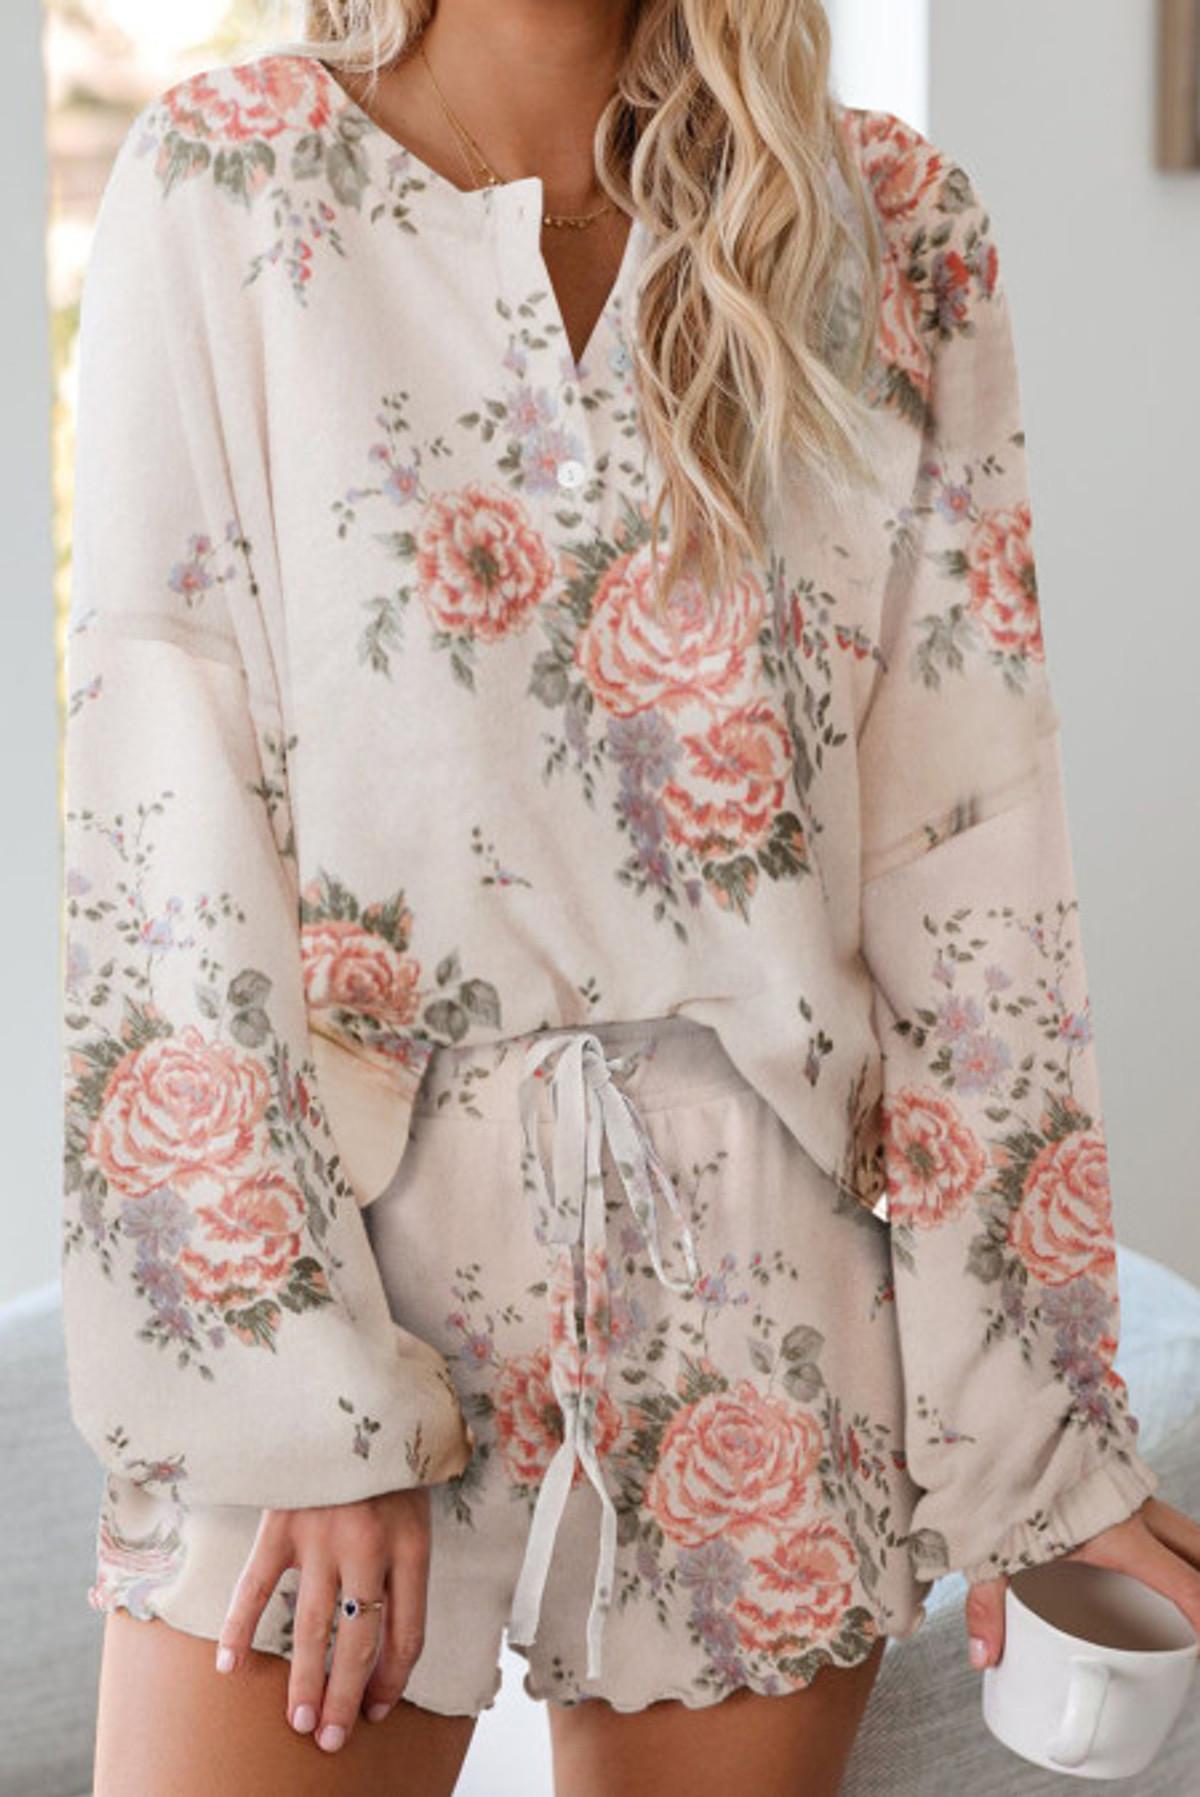 Floral Print Soft Pajama Set (FRE45019-1010)  FRE450191010P2XL